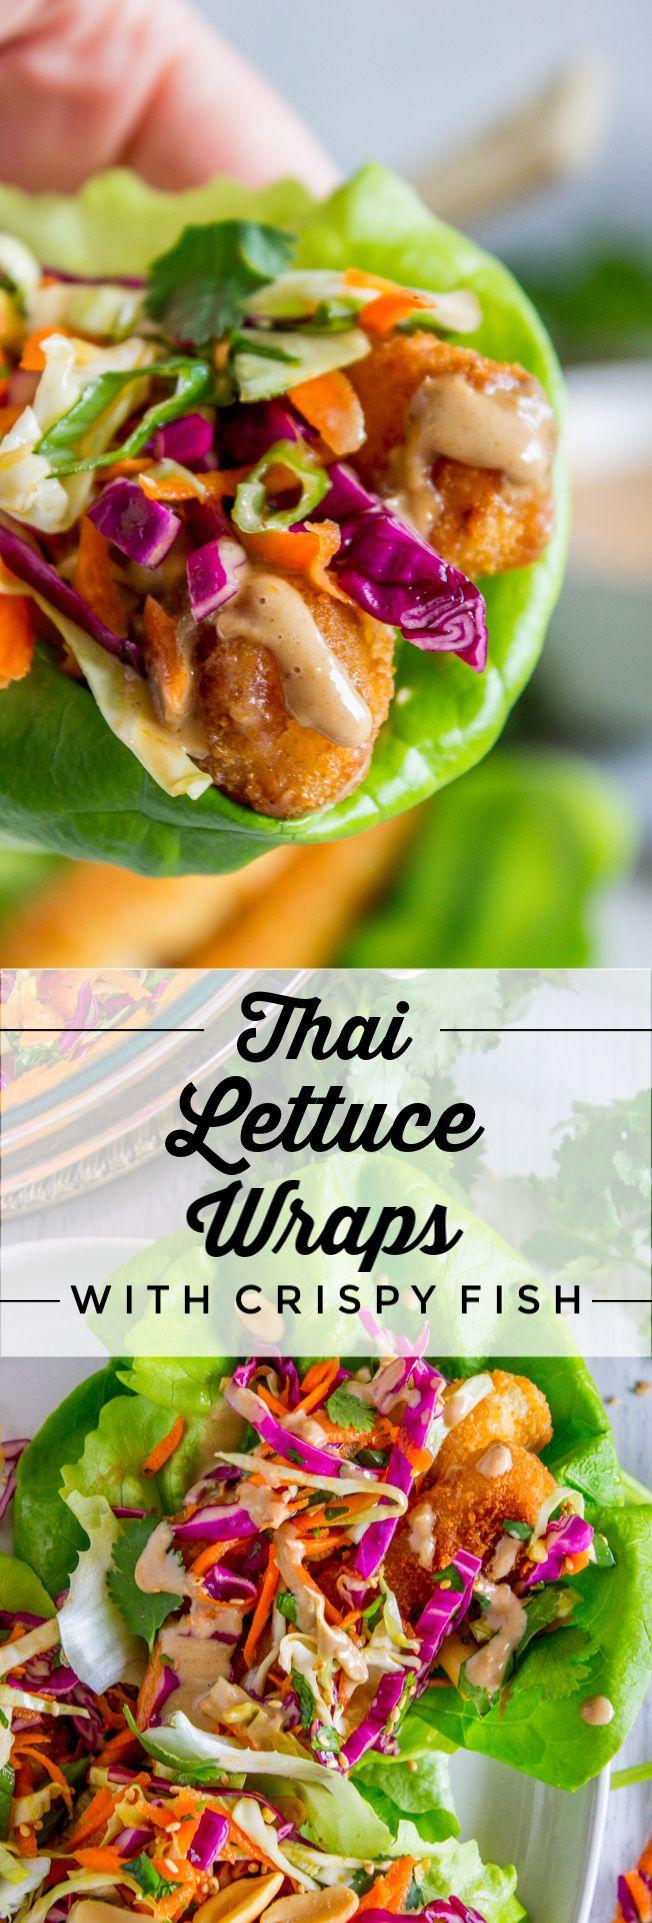 Thai Lettuce Wraps with Crispy Fish and Peanut Sau…